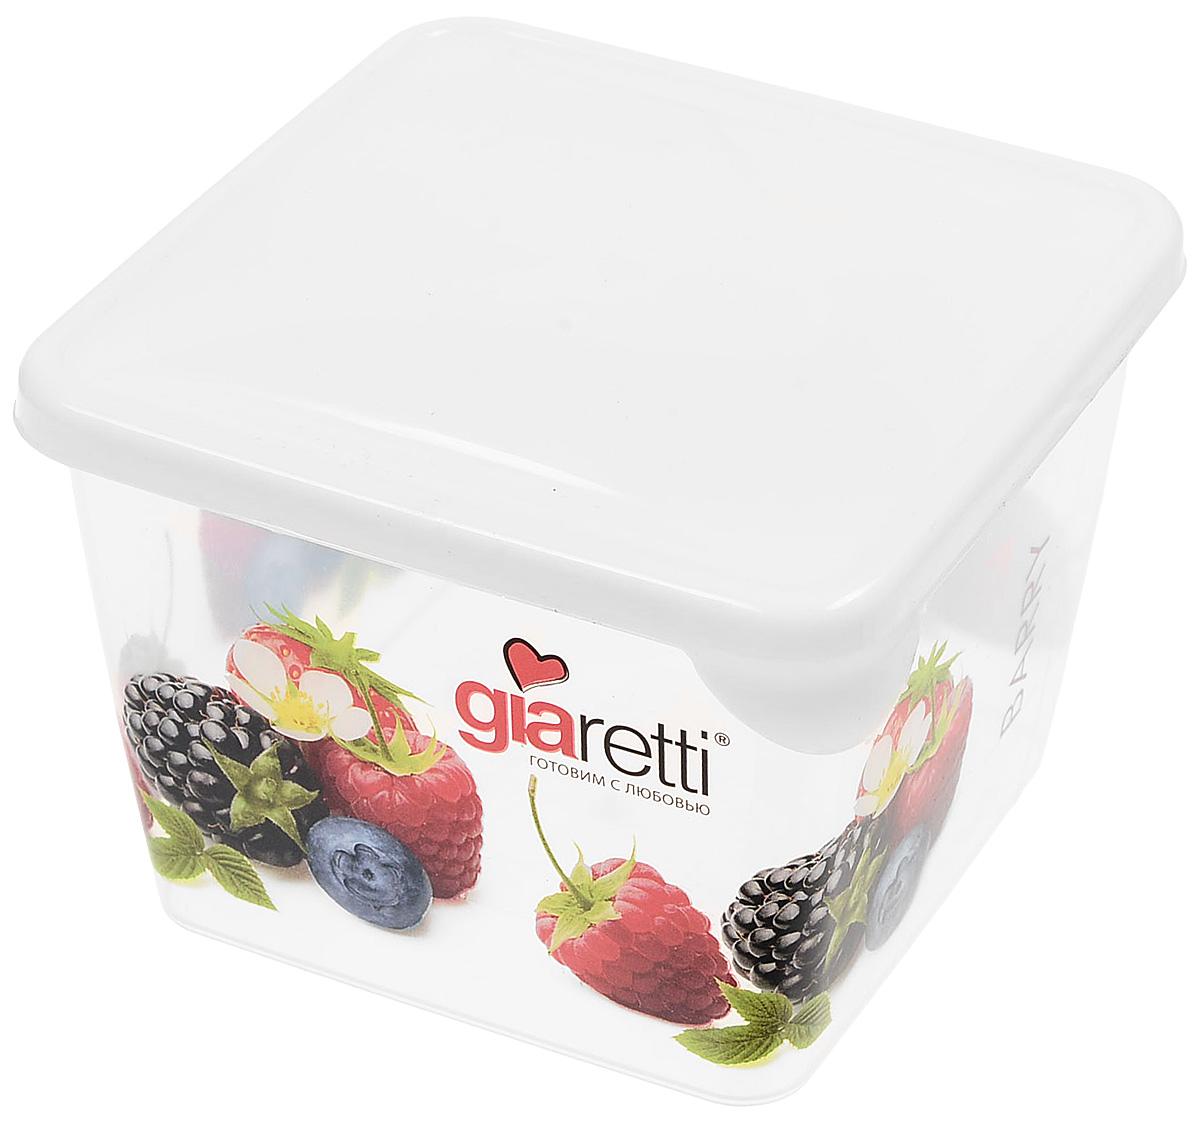 Емкость для продуктов Giaretti Браво, цвет: молочный, 750 мл. GR1065 емкость для продуктов giaretti браво цвет белый прозрачный 900 мл gr1068